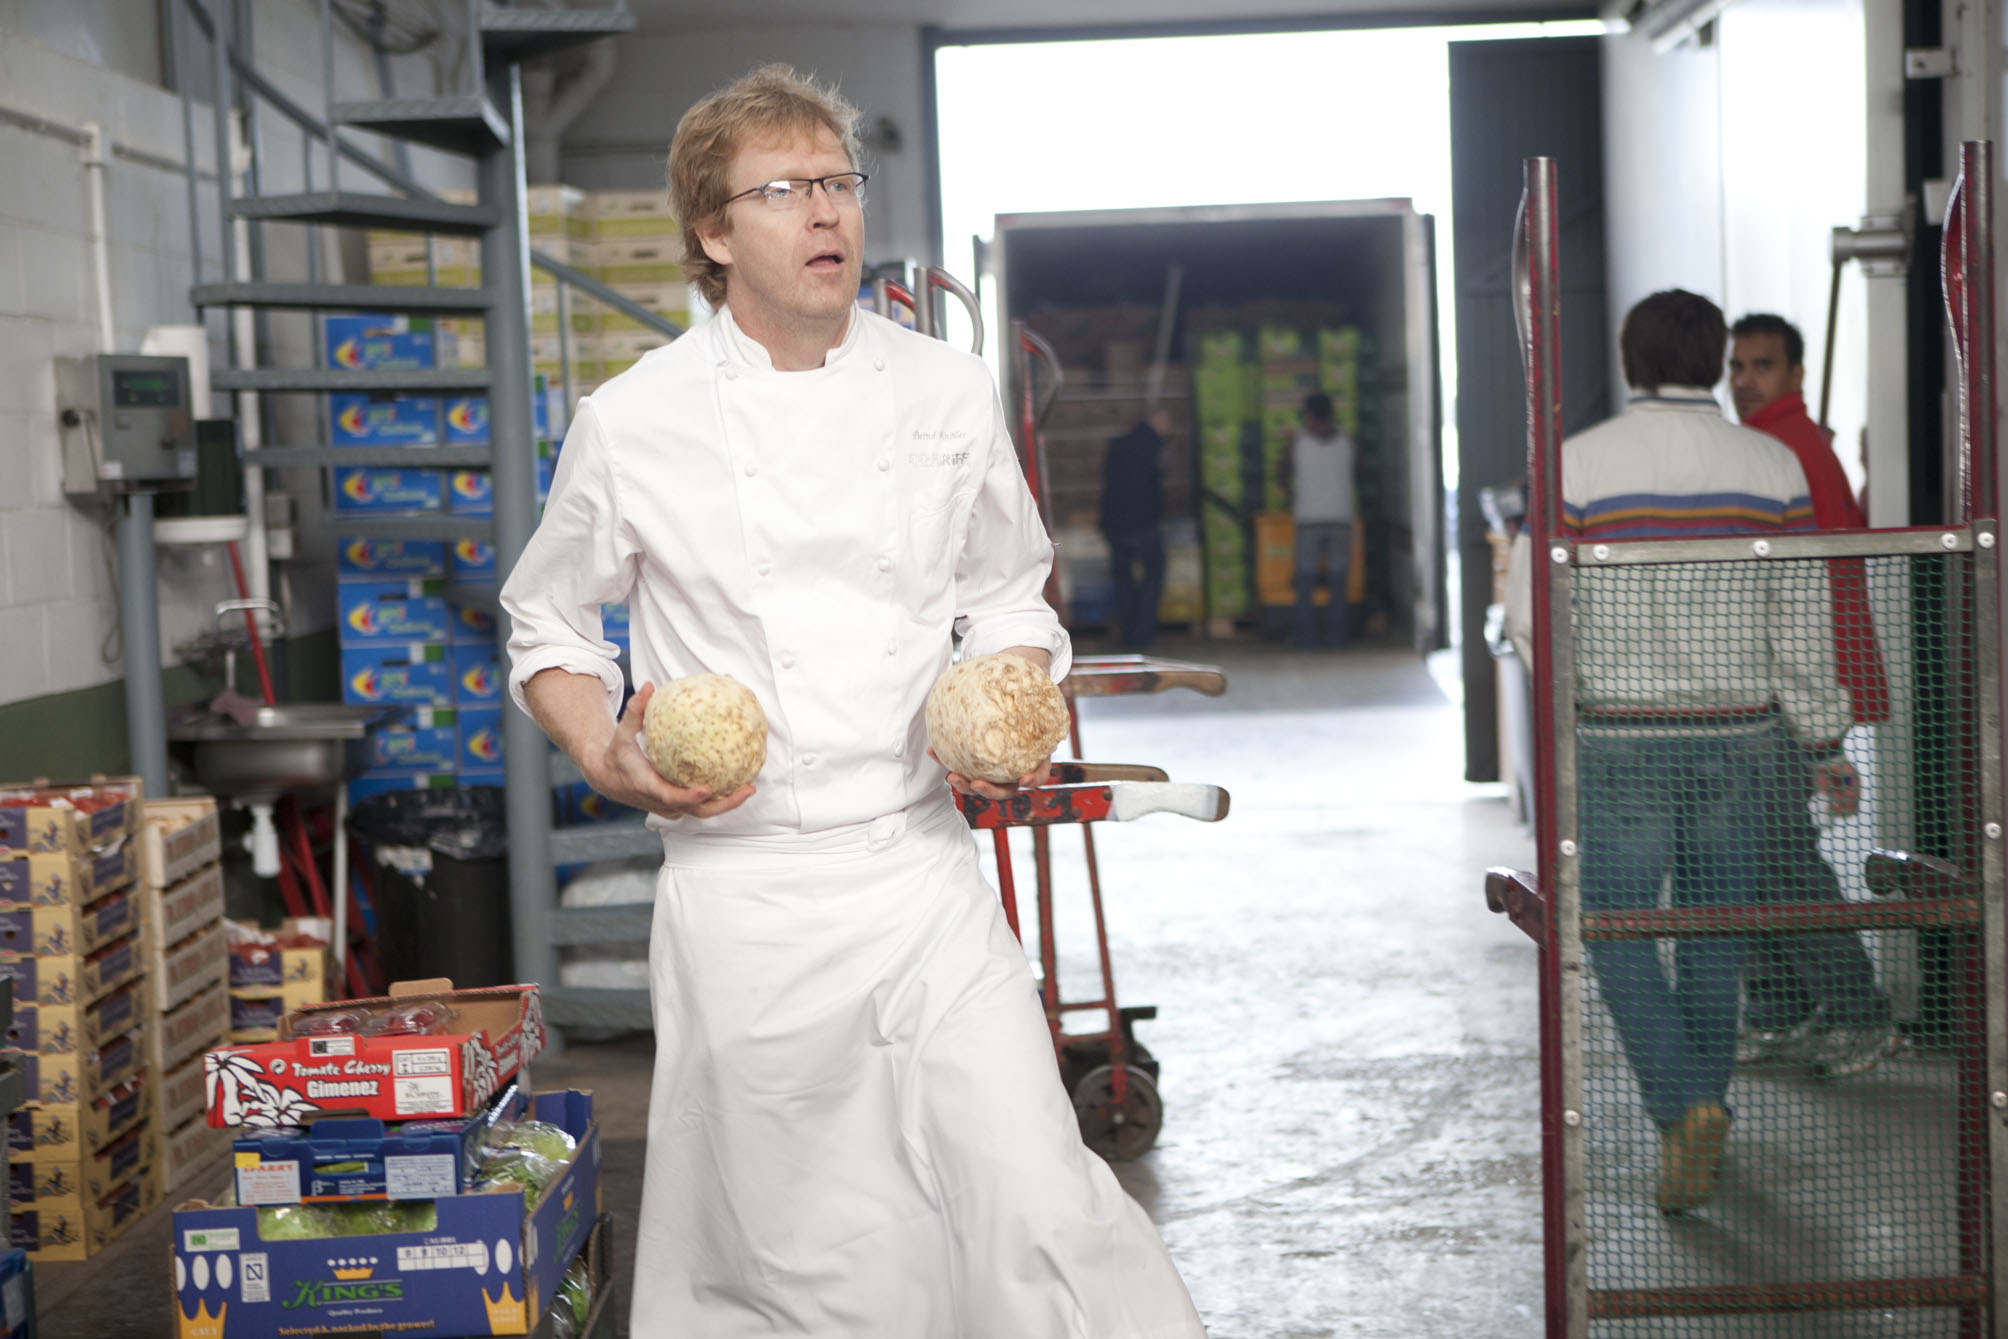 Bernd knoller Restaurante Riff